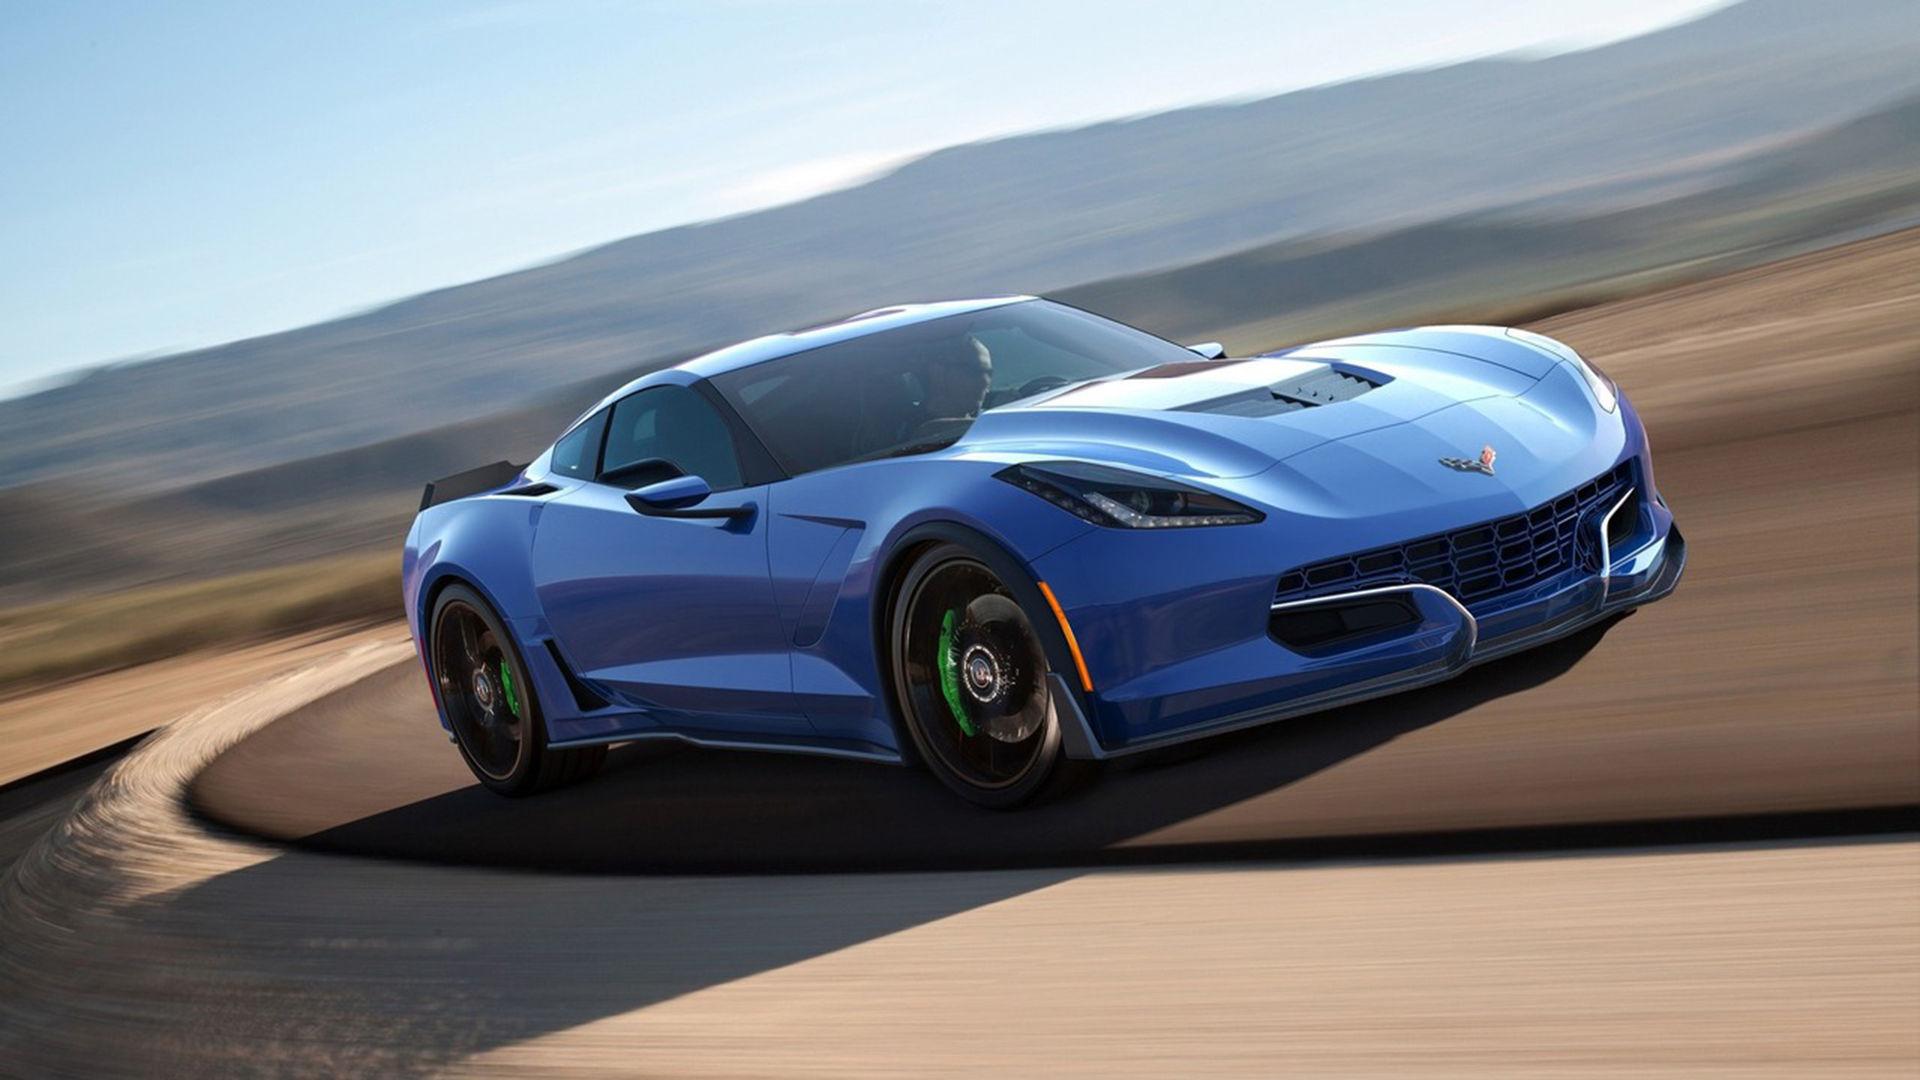 Ny version av eldriven Corvette visas i Las Vegas